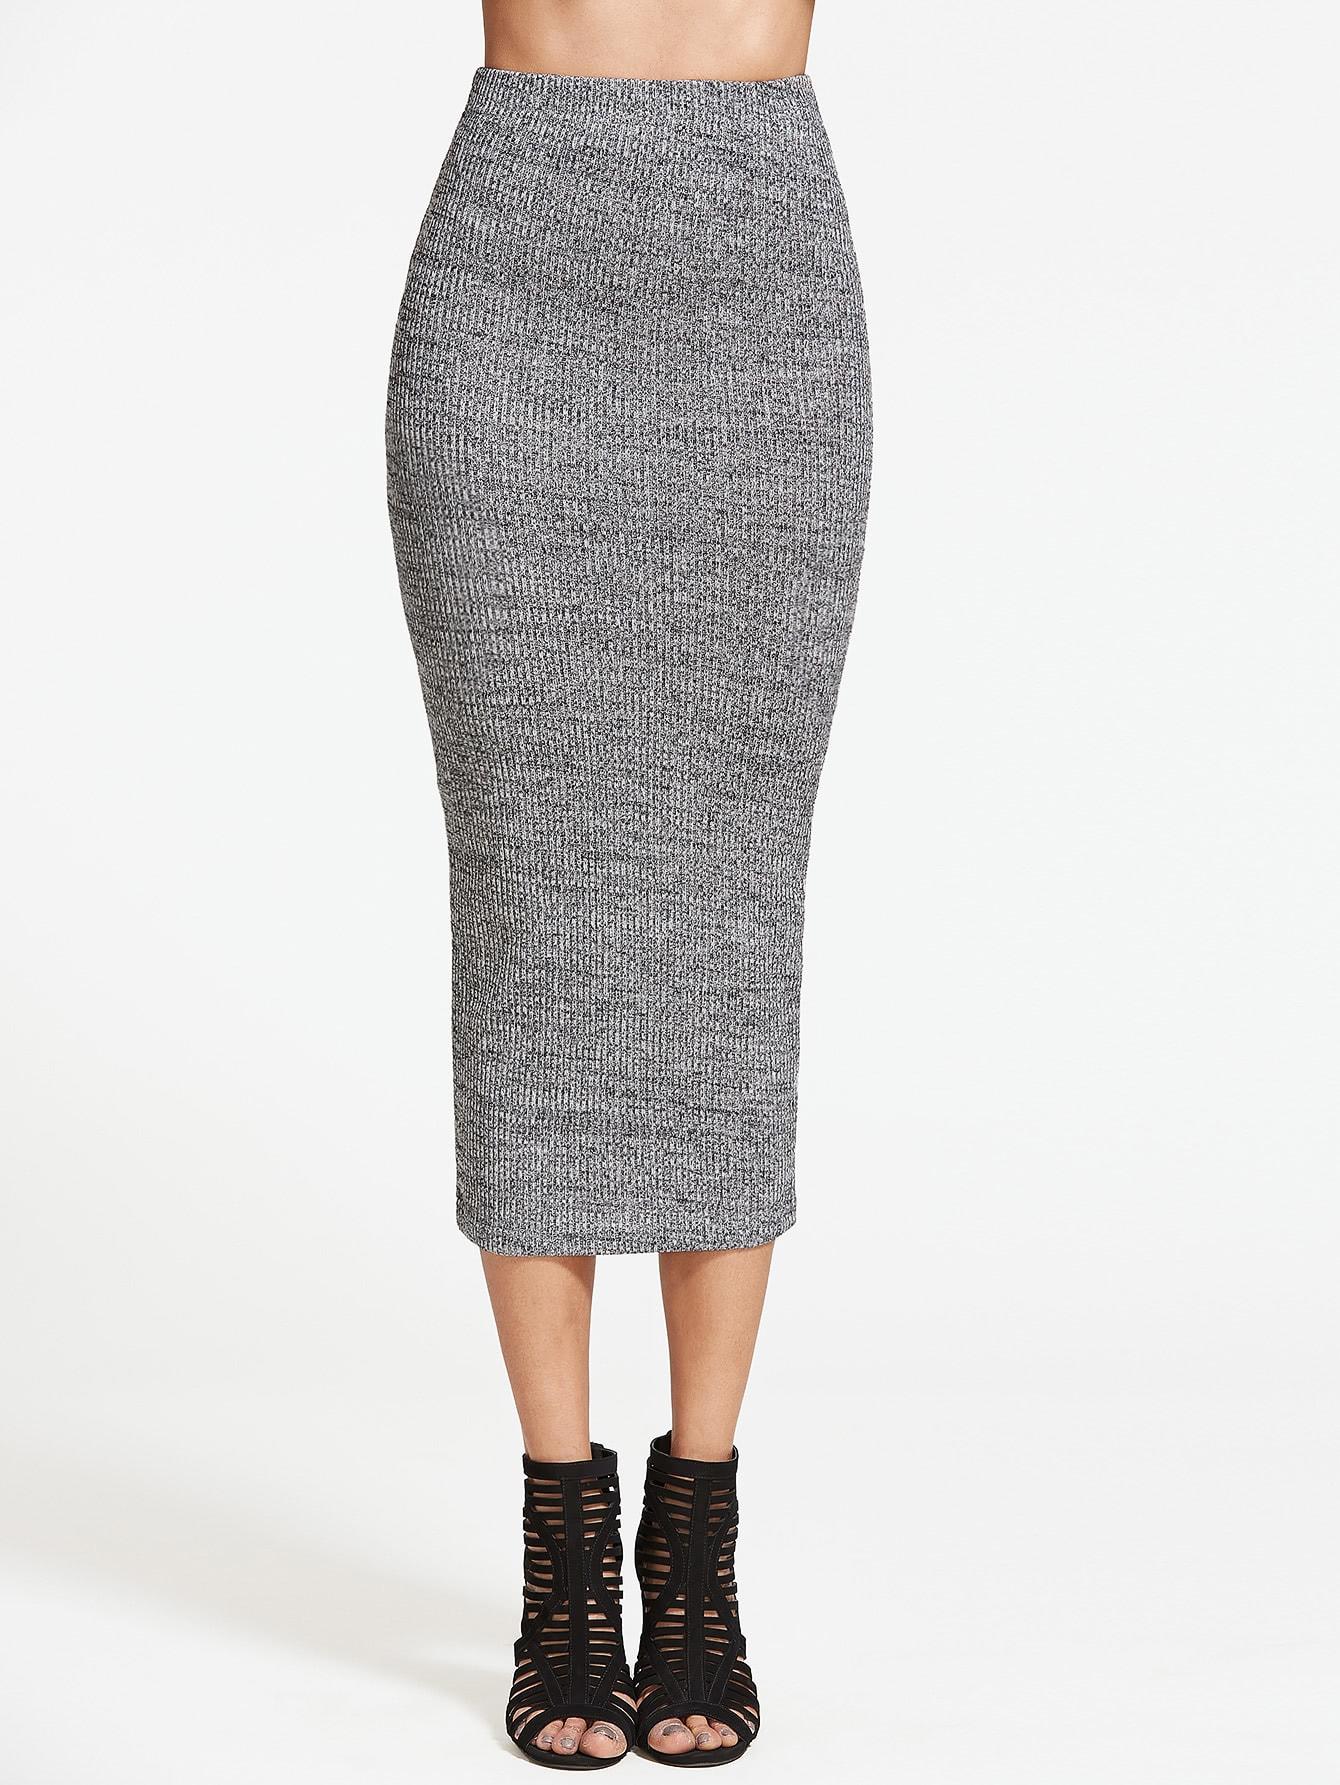 Heather Grey Ribbed Knit Pencil Skirt -SheIn(Sheinside)